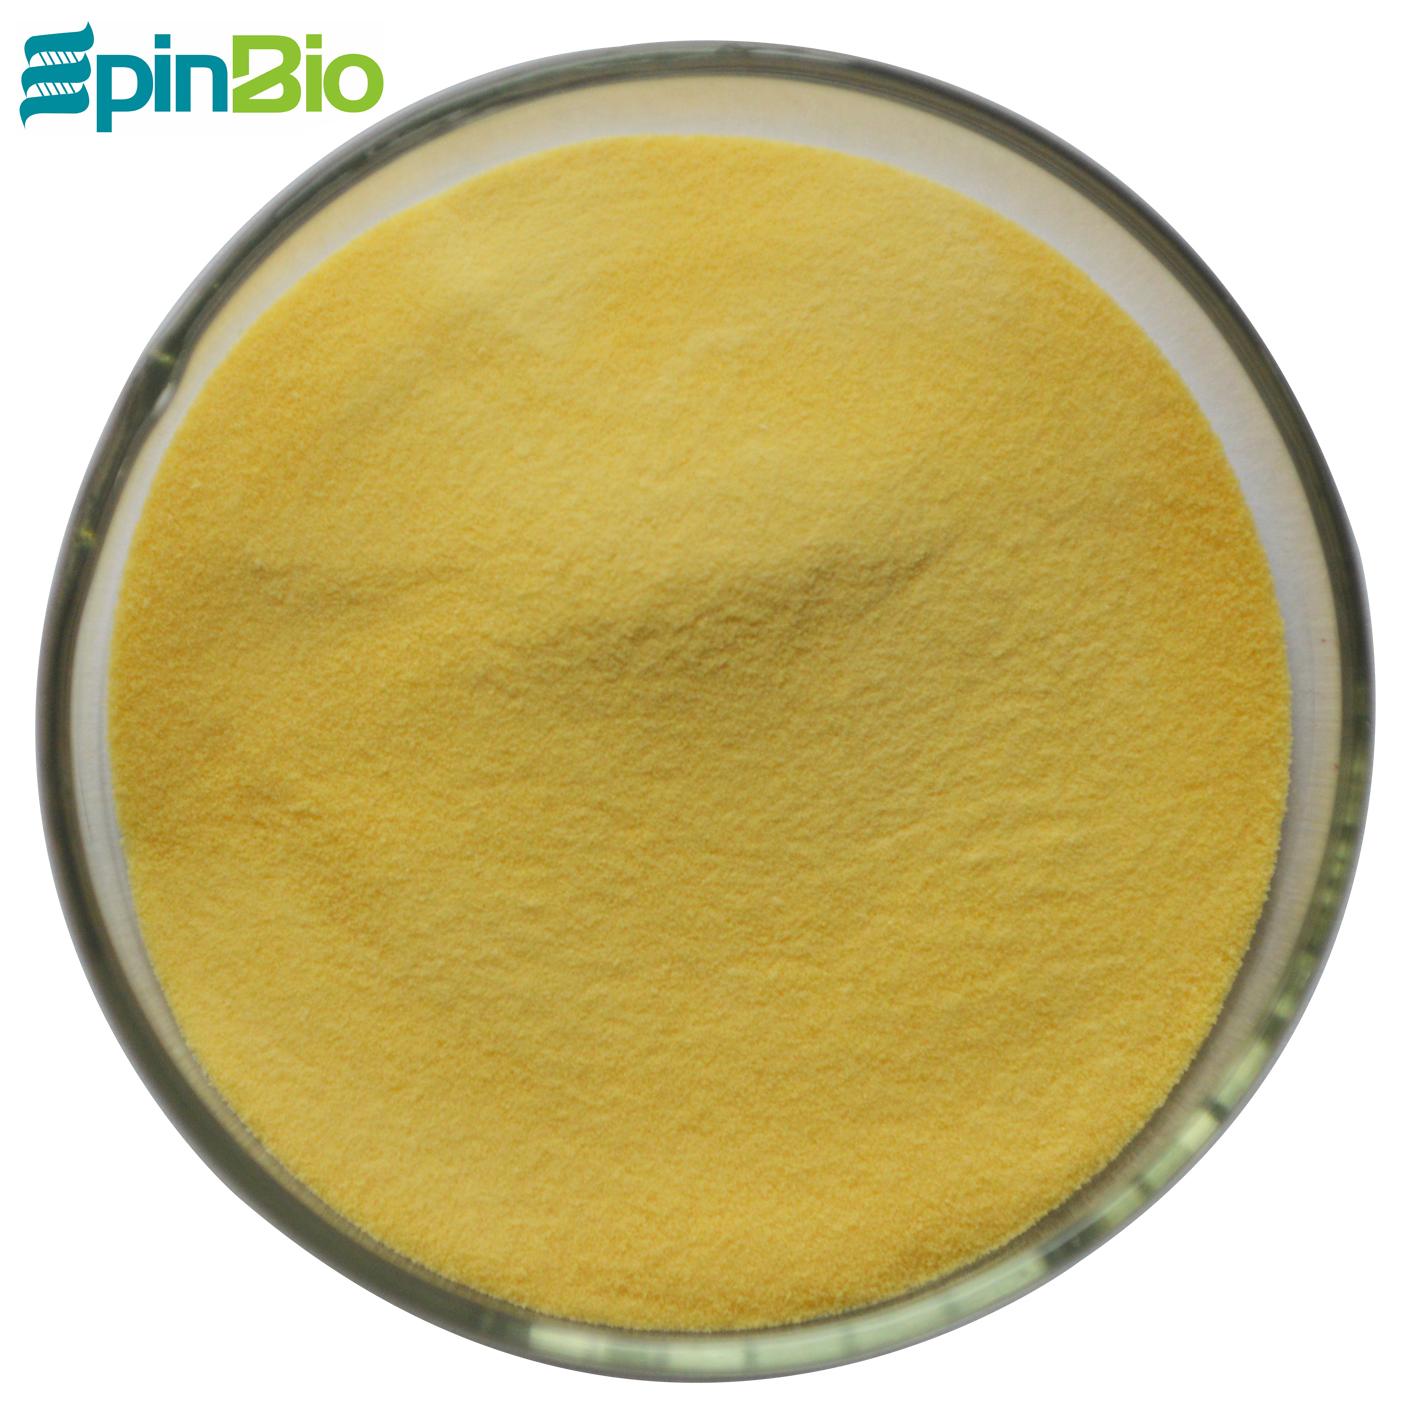 Epinbio provides EP USP Vitamin A acetate powder 500cws/ Retinyl acetate